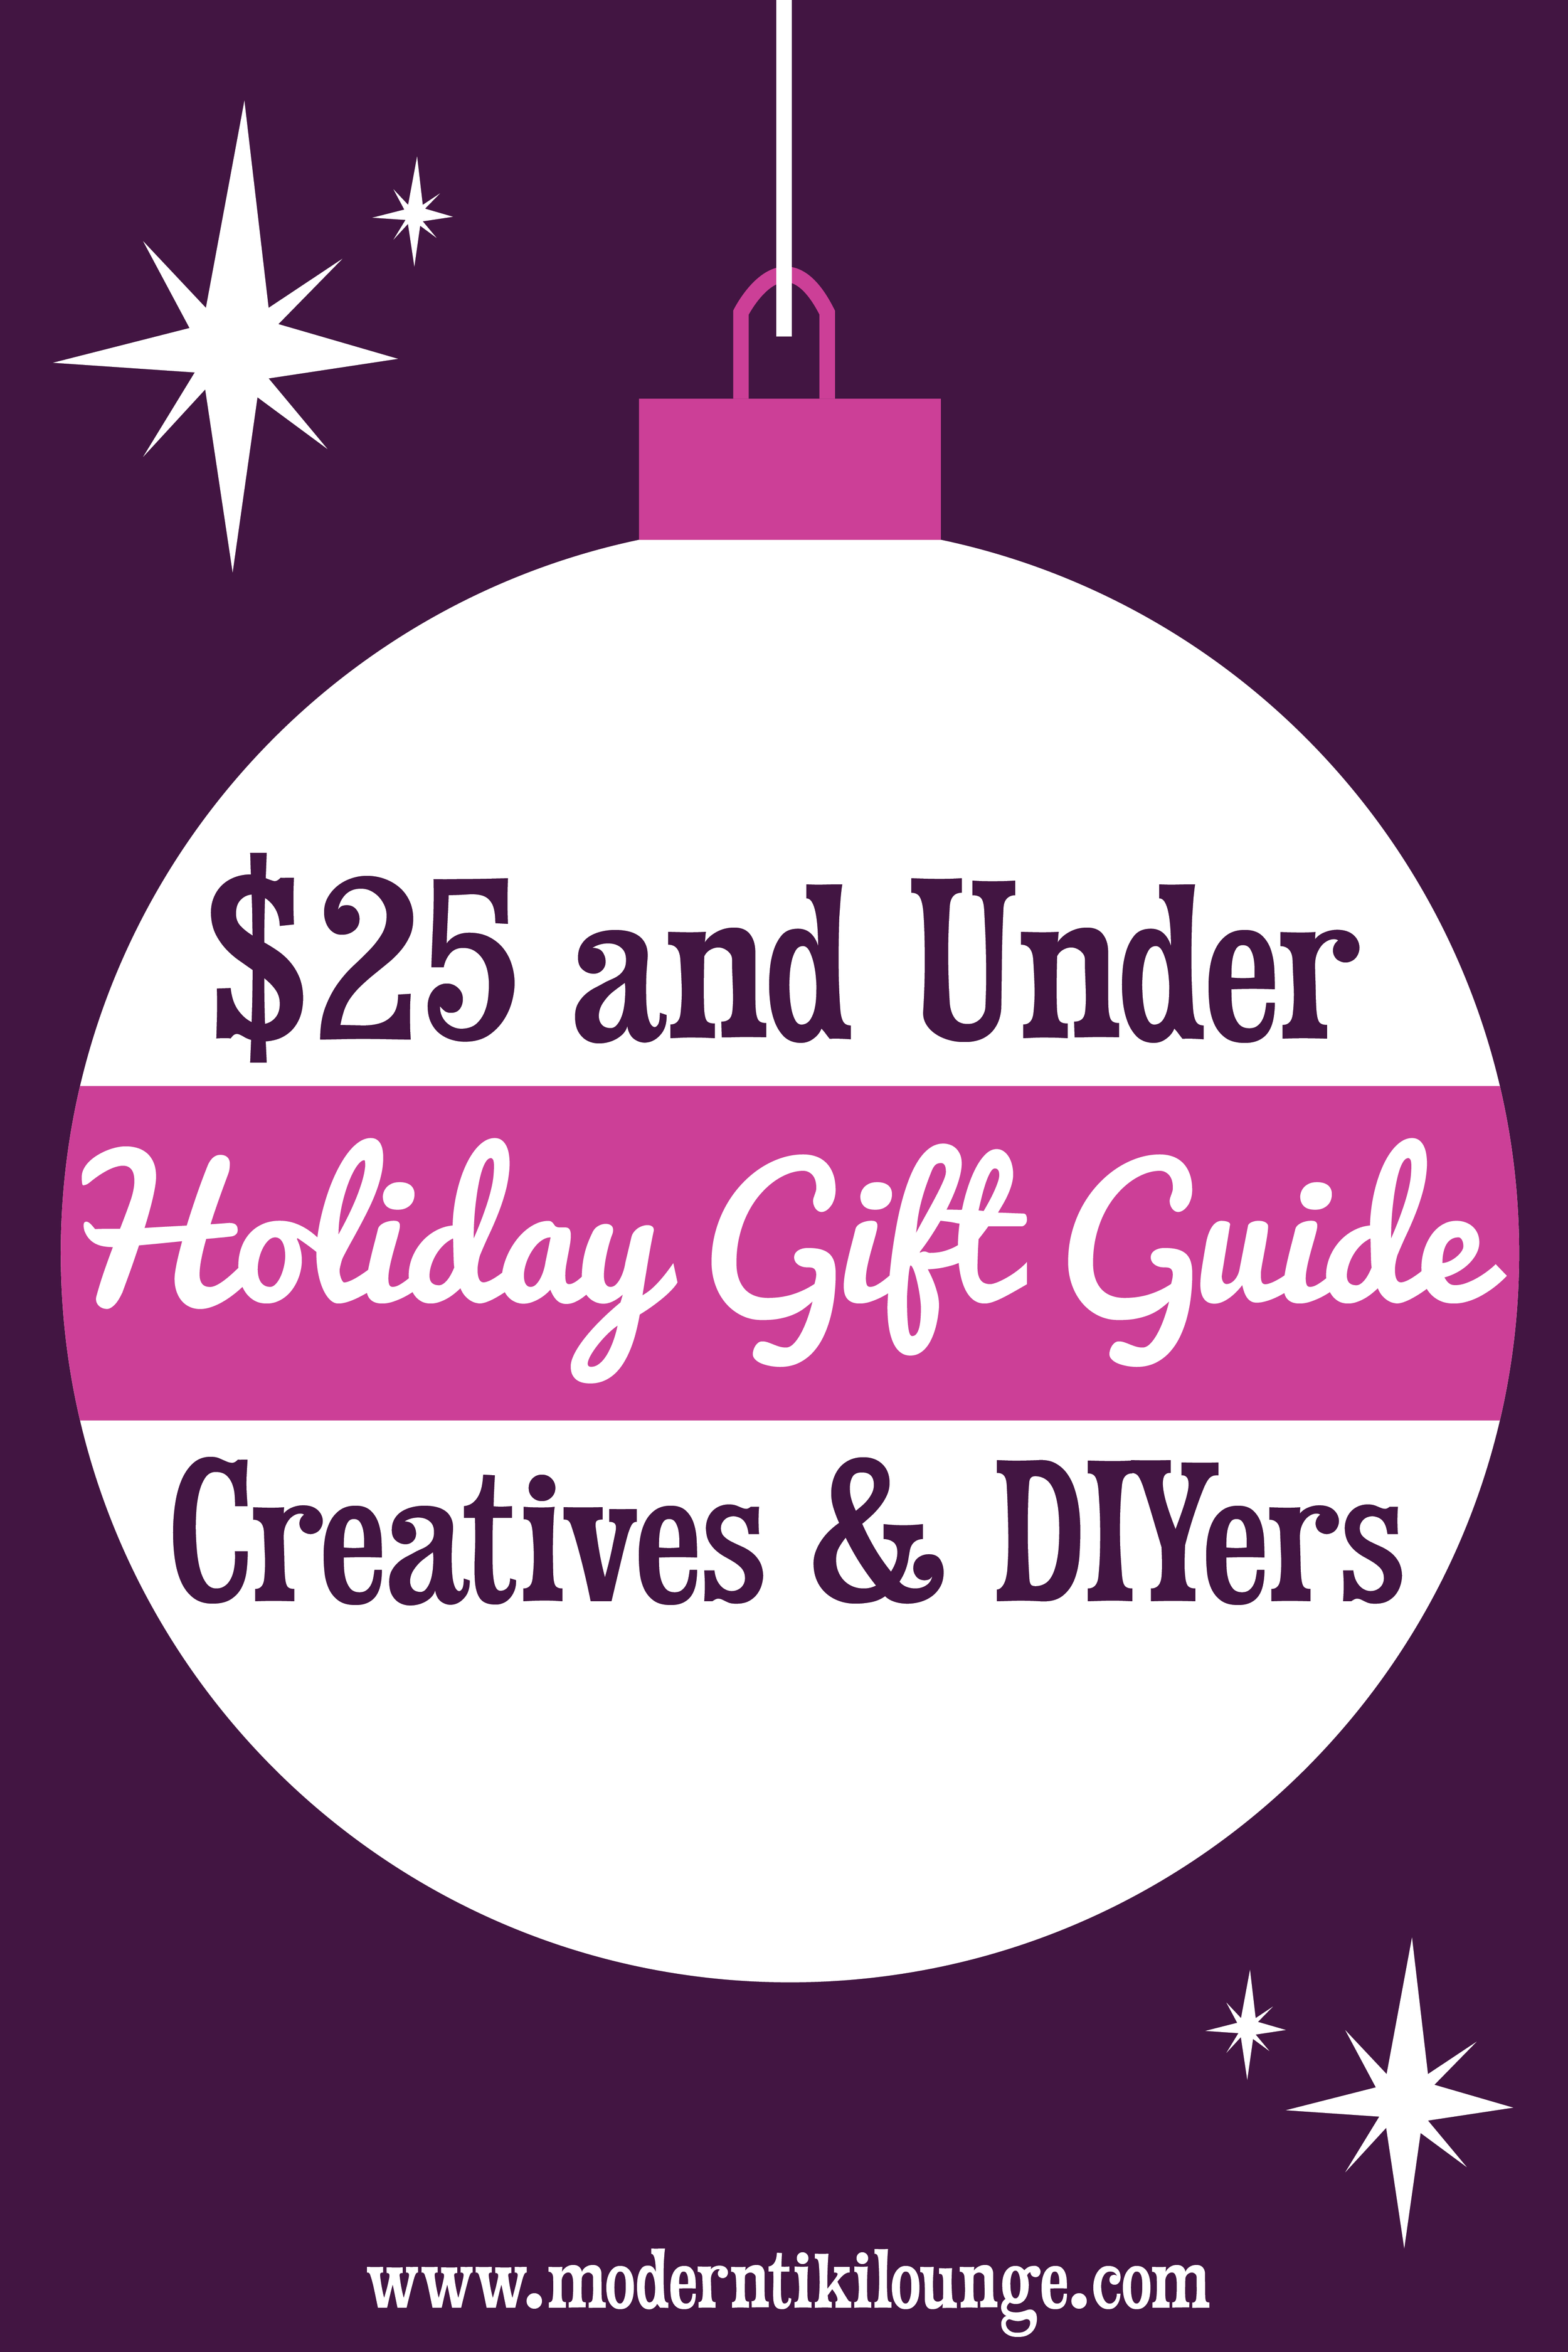 holiday-gift-guide-creatives-diyers.jpg